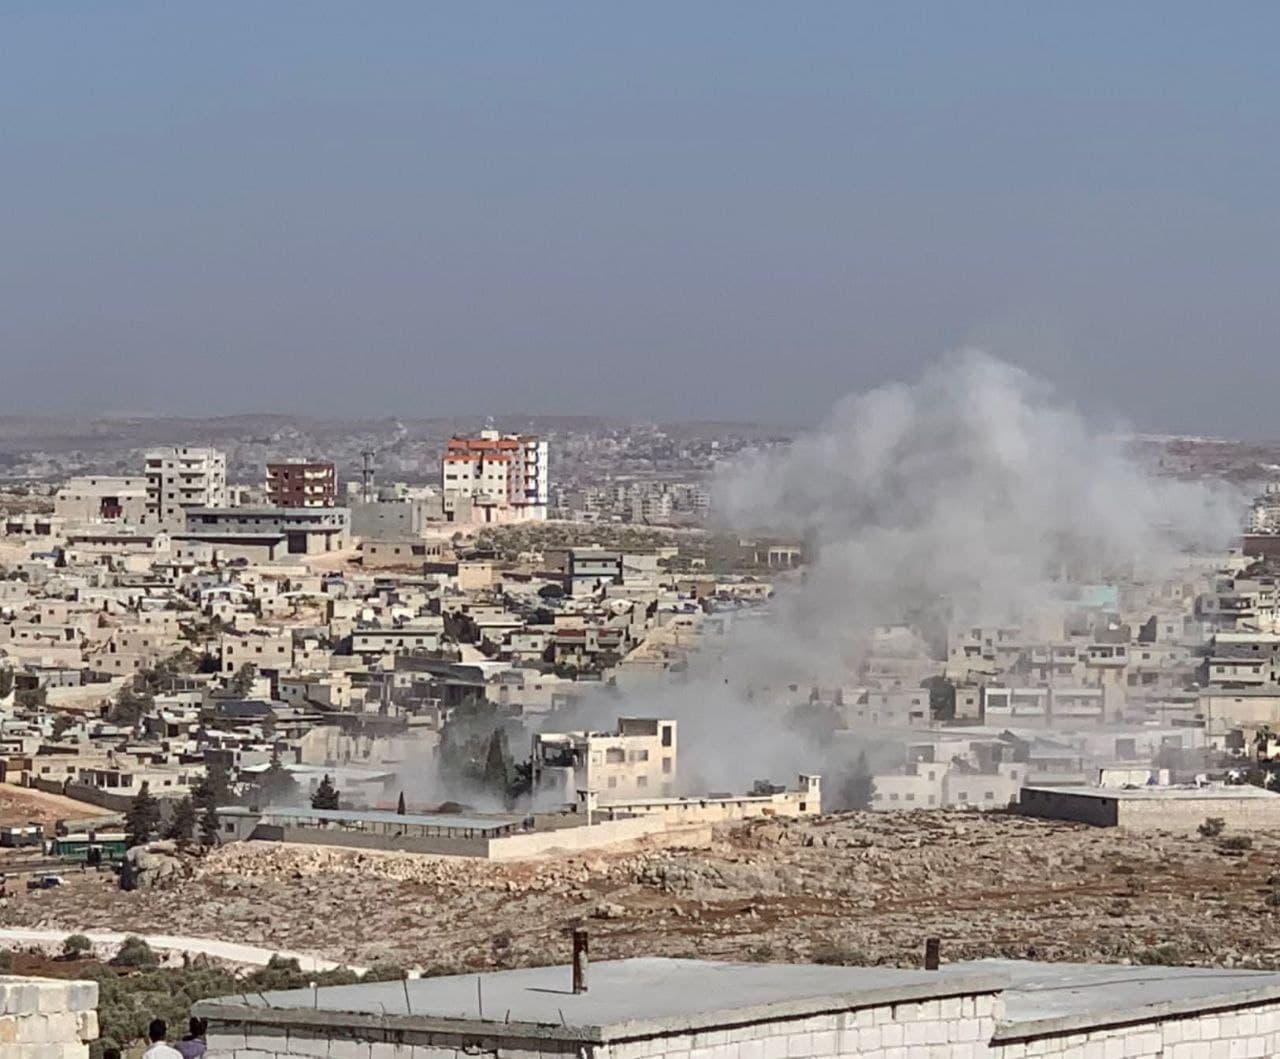 Syria's Response Coordinators Warn of Regime Escalation North of Idleb